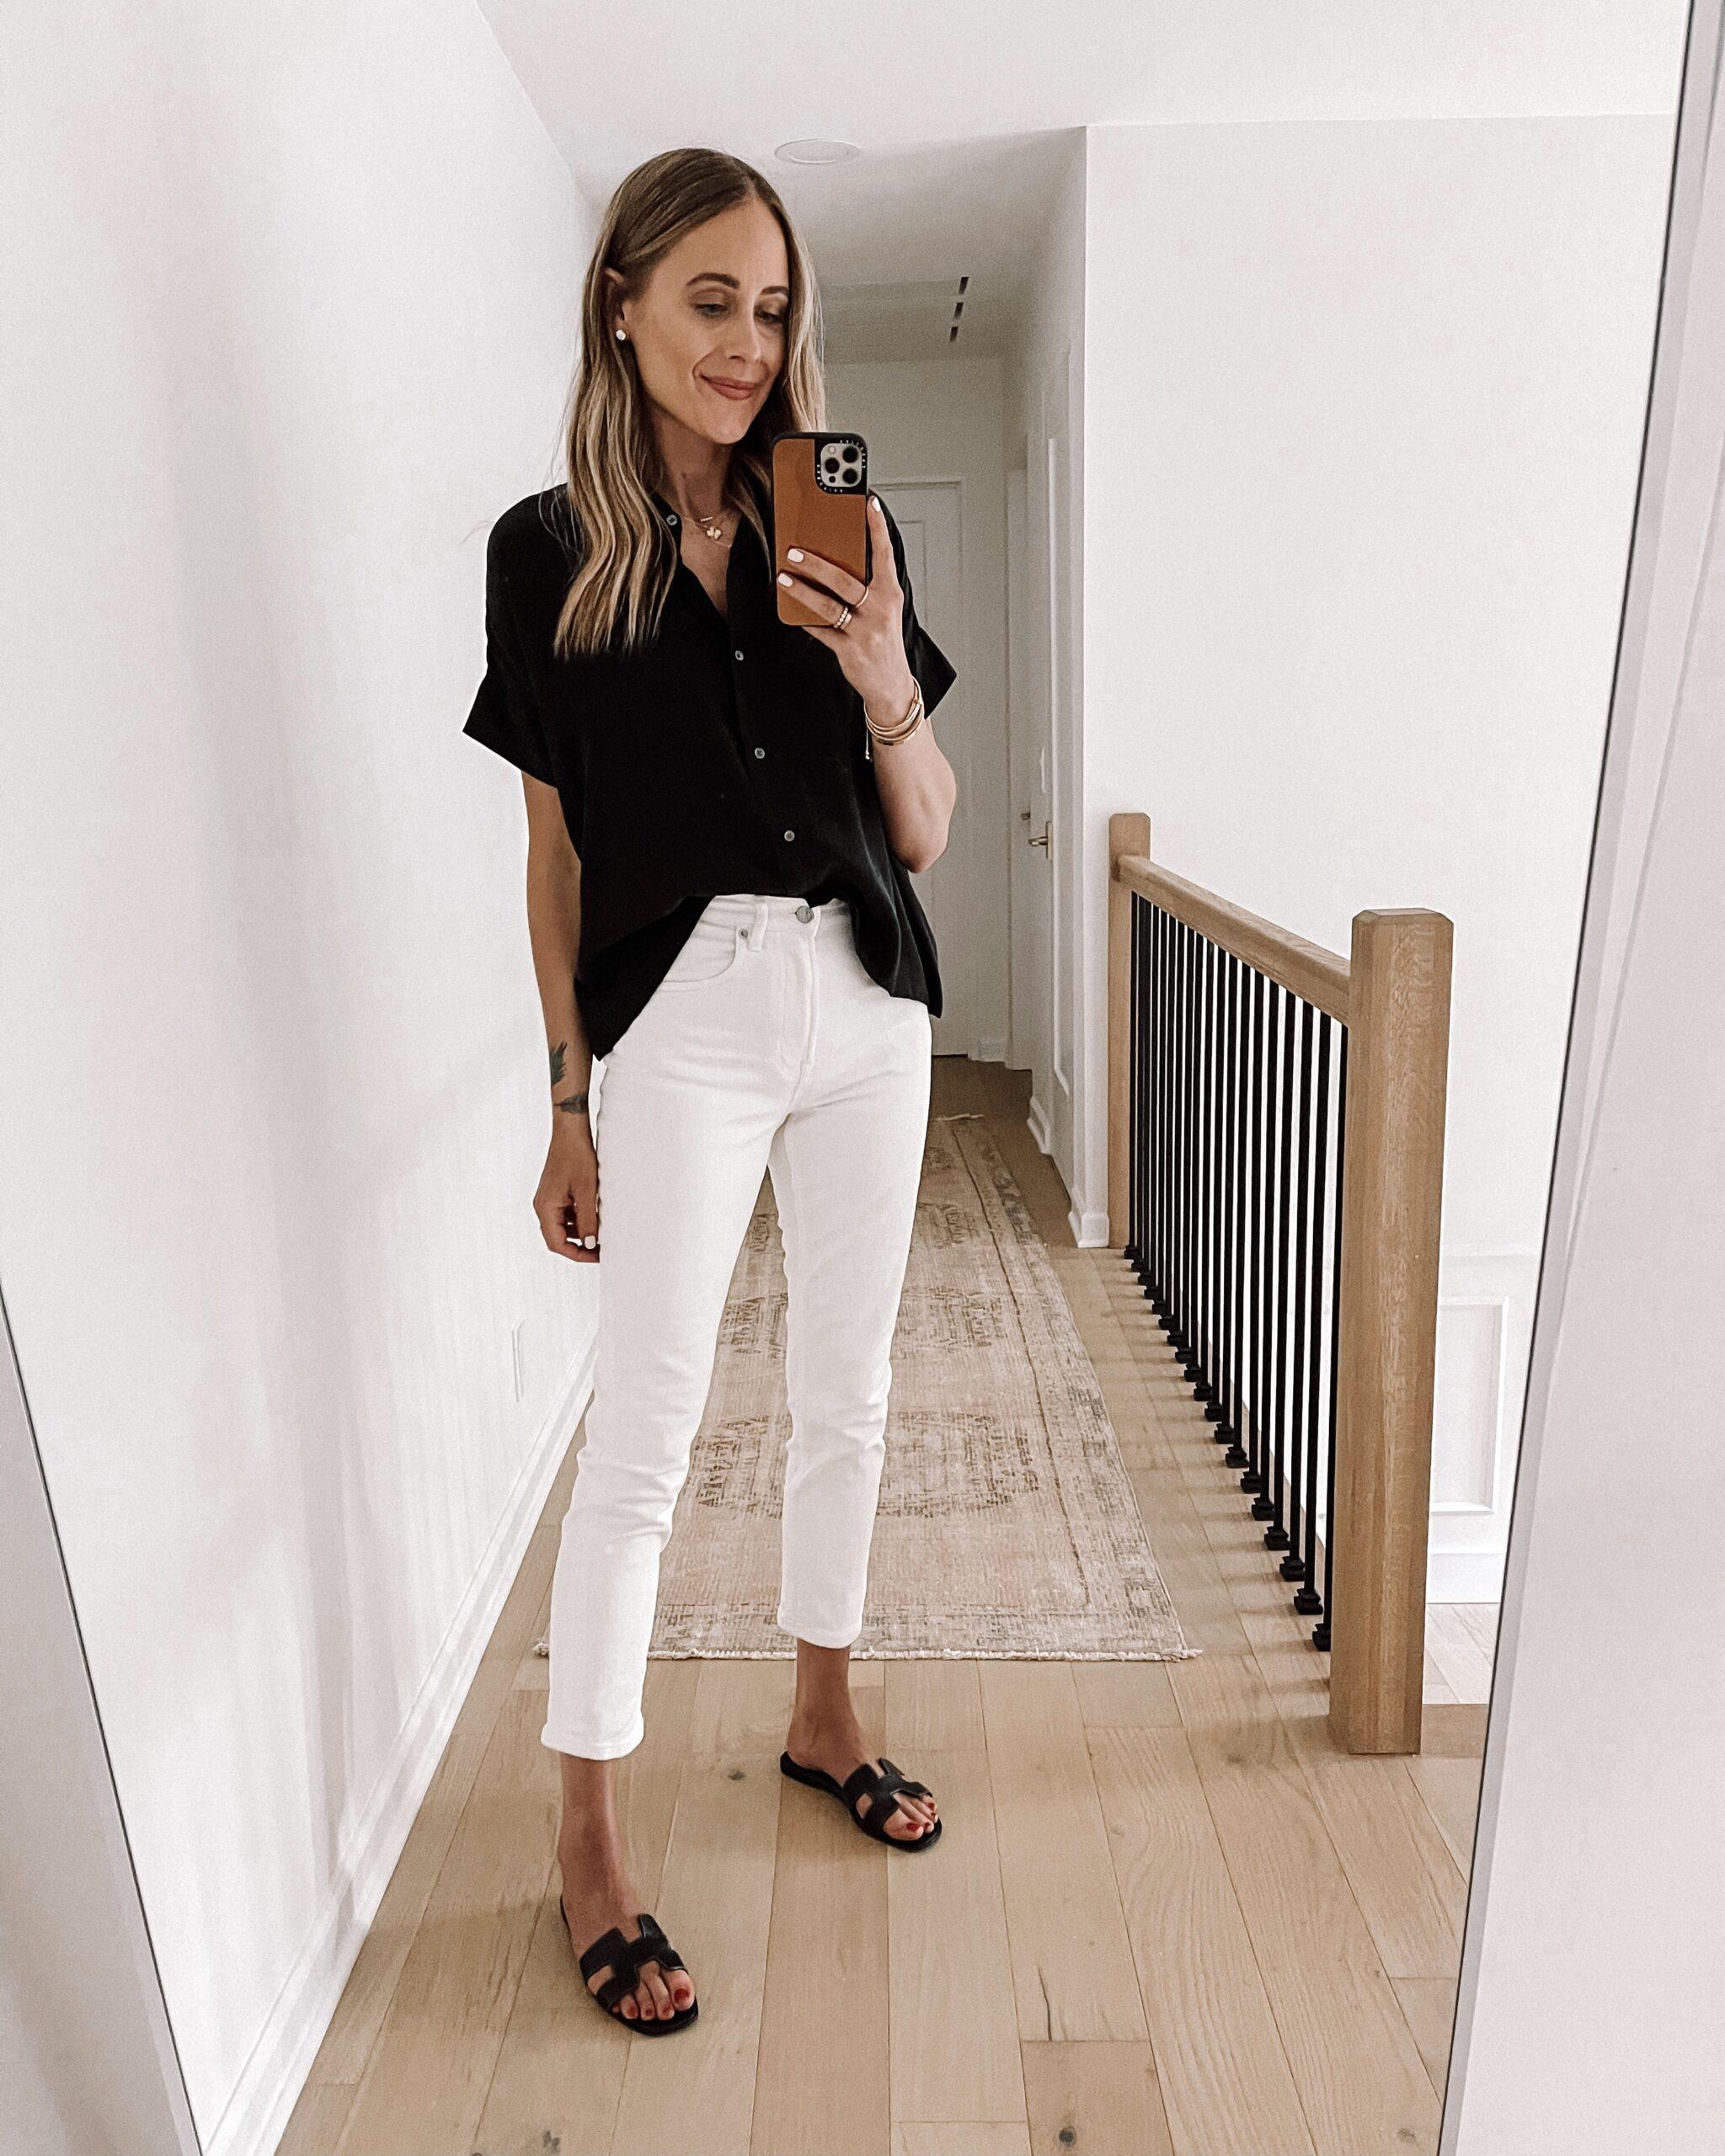 Fashion Jackson Wearing Everlane Black Button Up Shirt Everlane White Jeans Black Sandals Everlane Summer Outfit